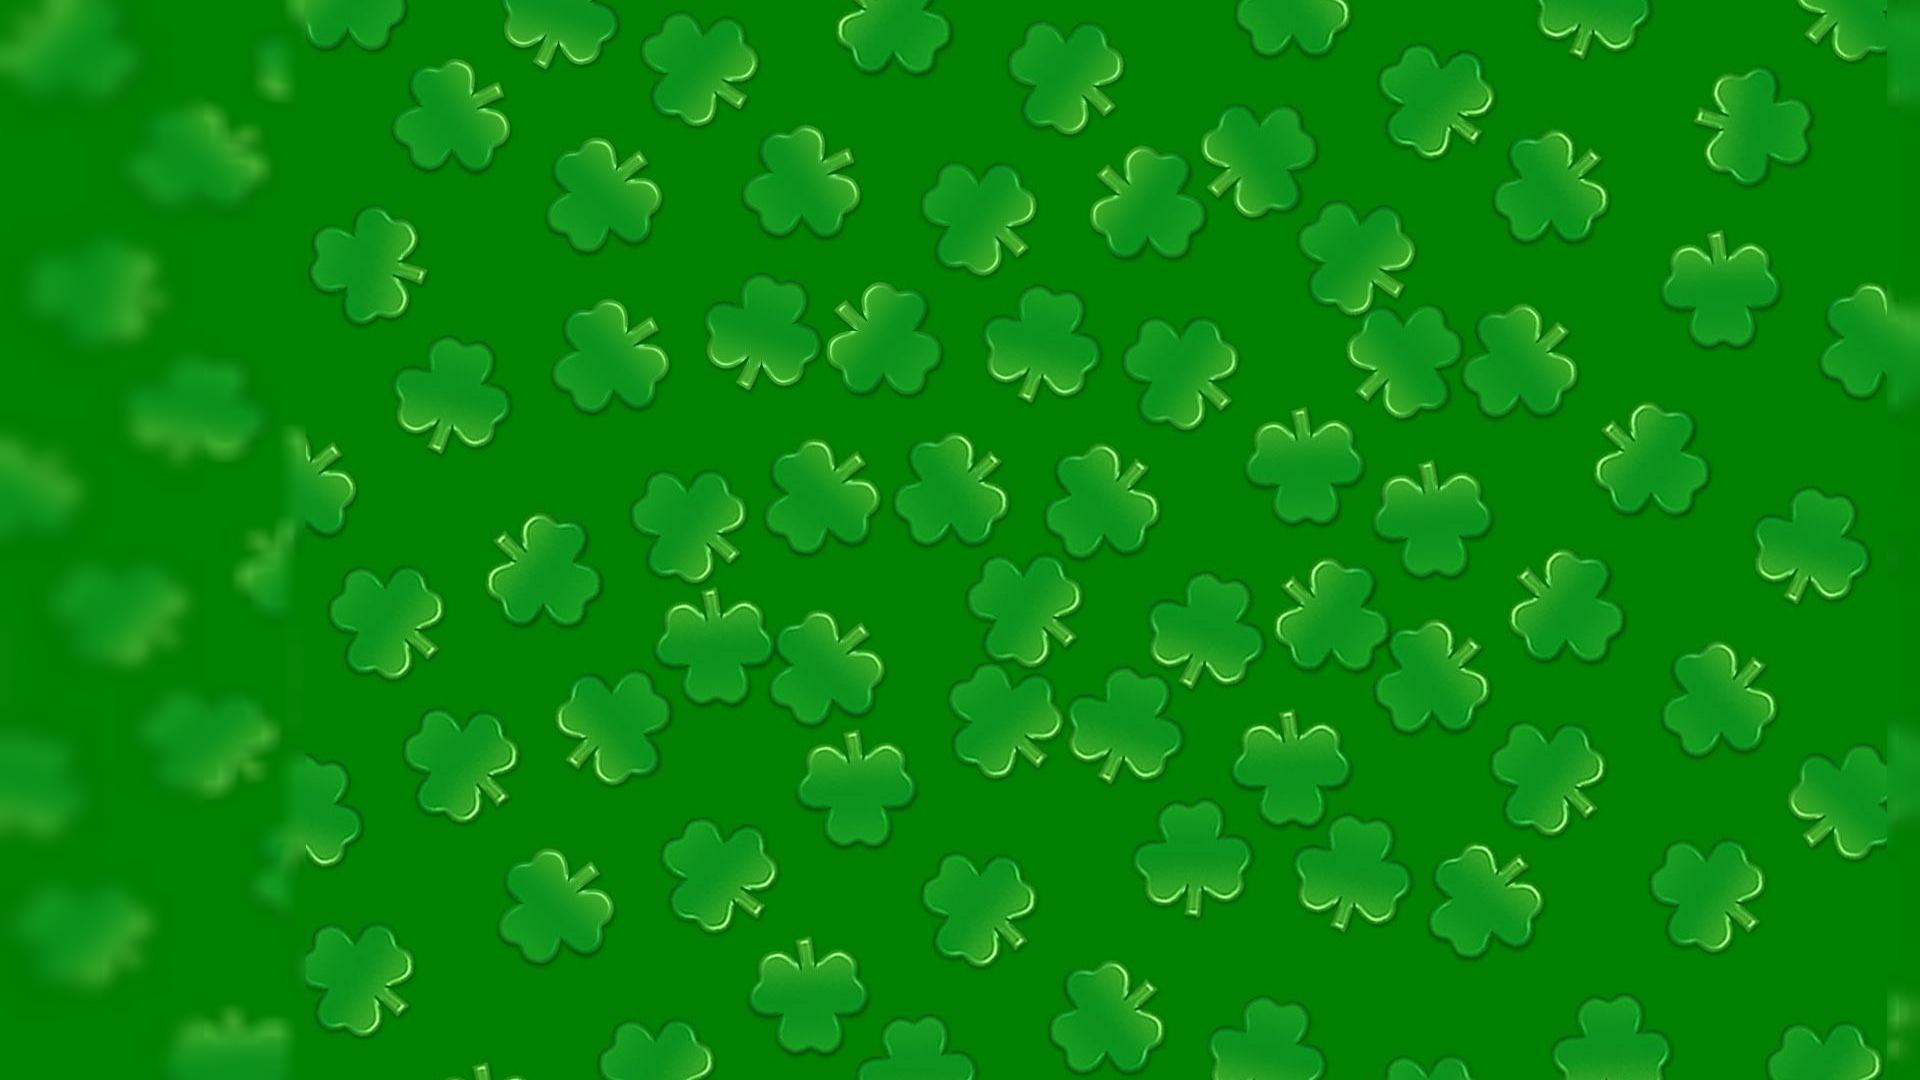 St Patricks St Patricks Day St Patricks Day HD Wallpaper 1920x1080